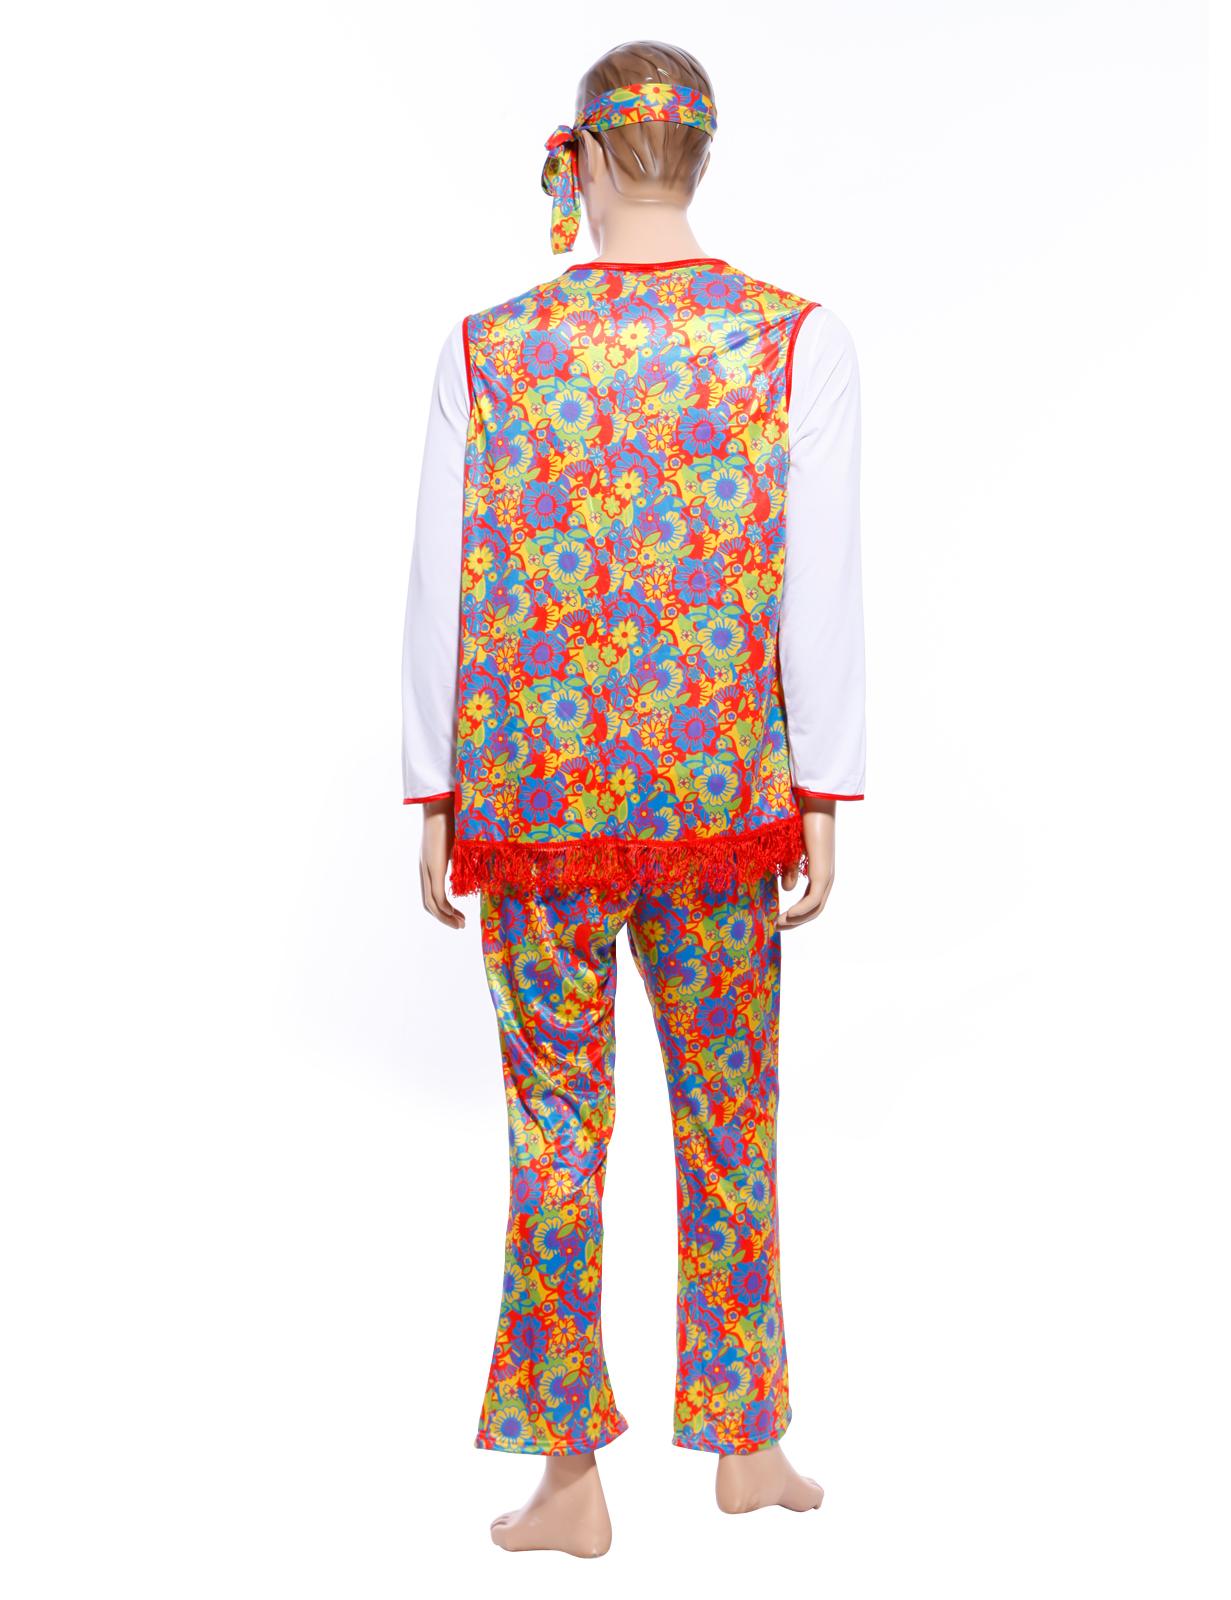 costume d guisement tenue combinaison homme annee 60 70 hippy hippie retro gogo ebay. Black Bedroom Furniture Sets. Home Design Ideas